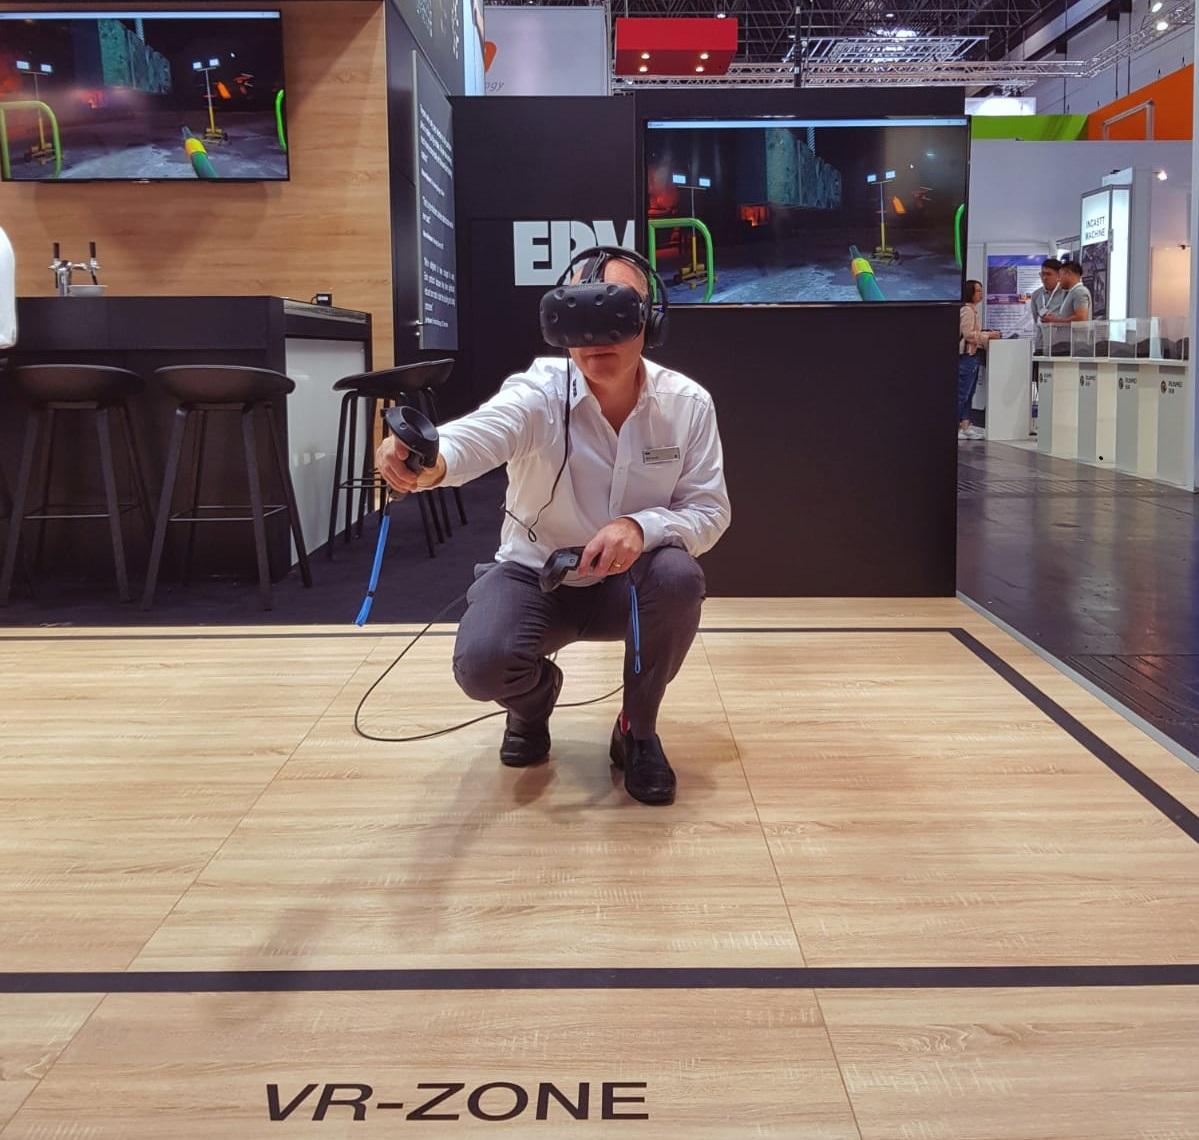 Ervin_Virtual_Reality.jpg